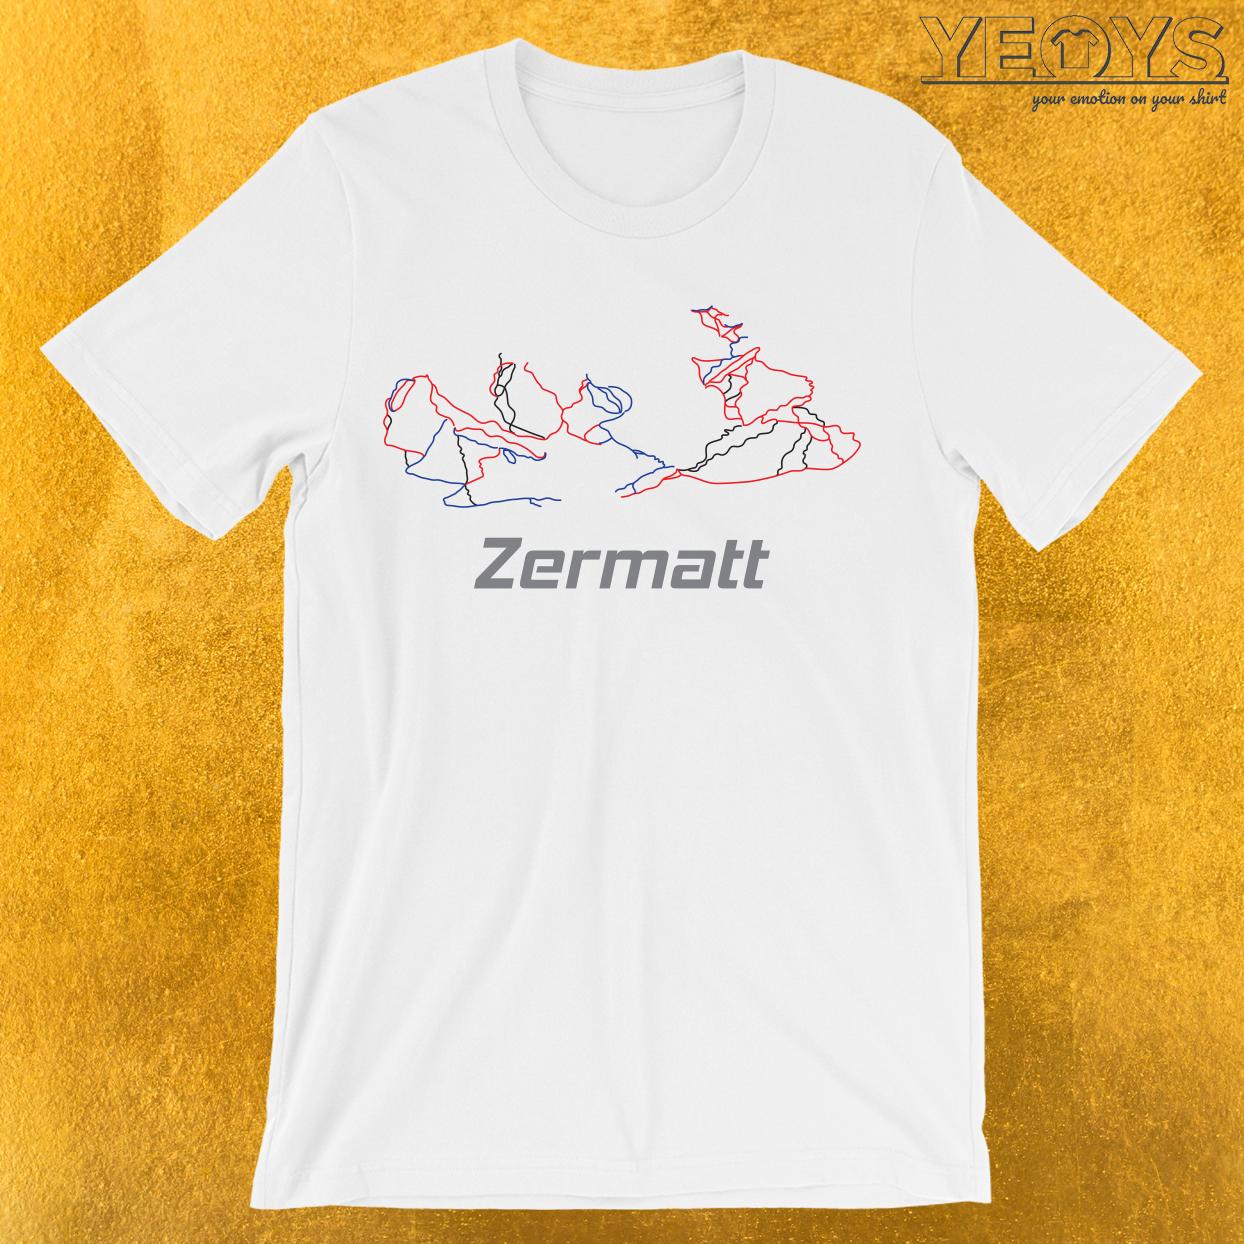 Zermatt Schweiz Ski Piste Karte T-Shirt